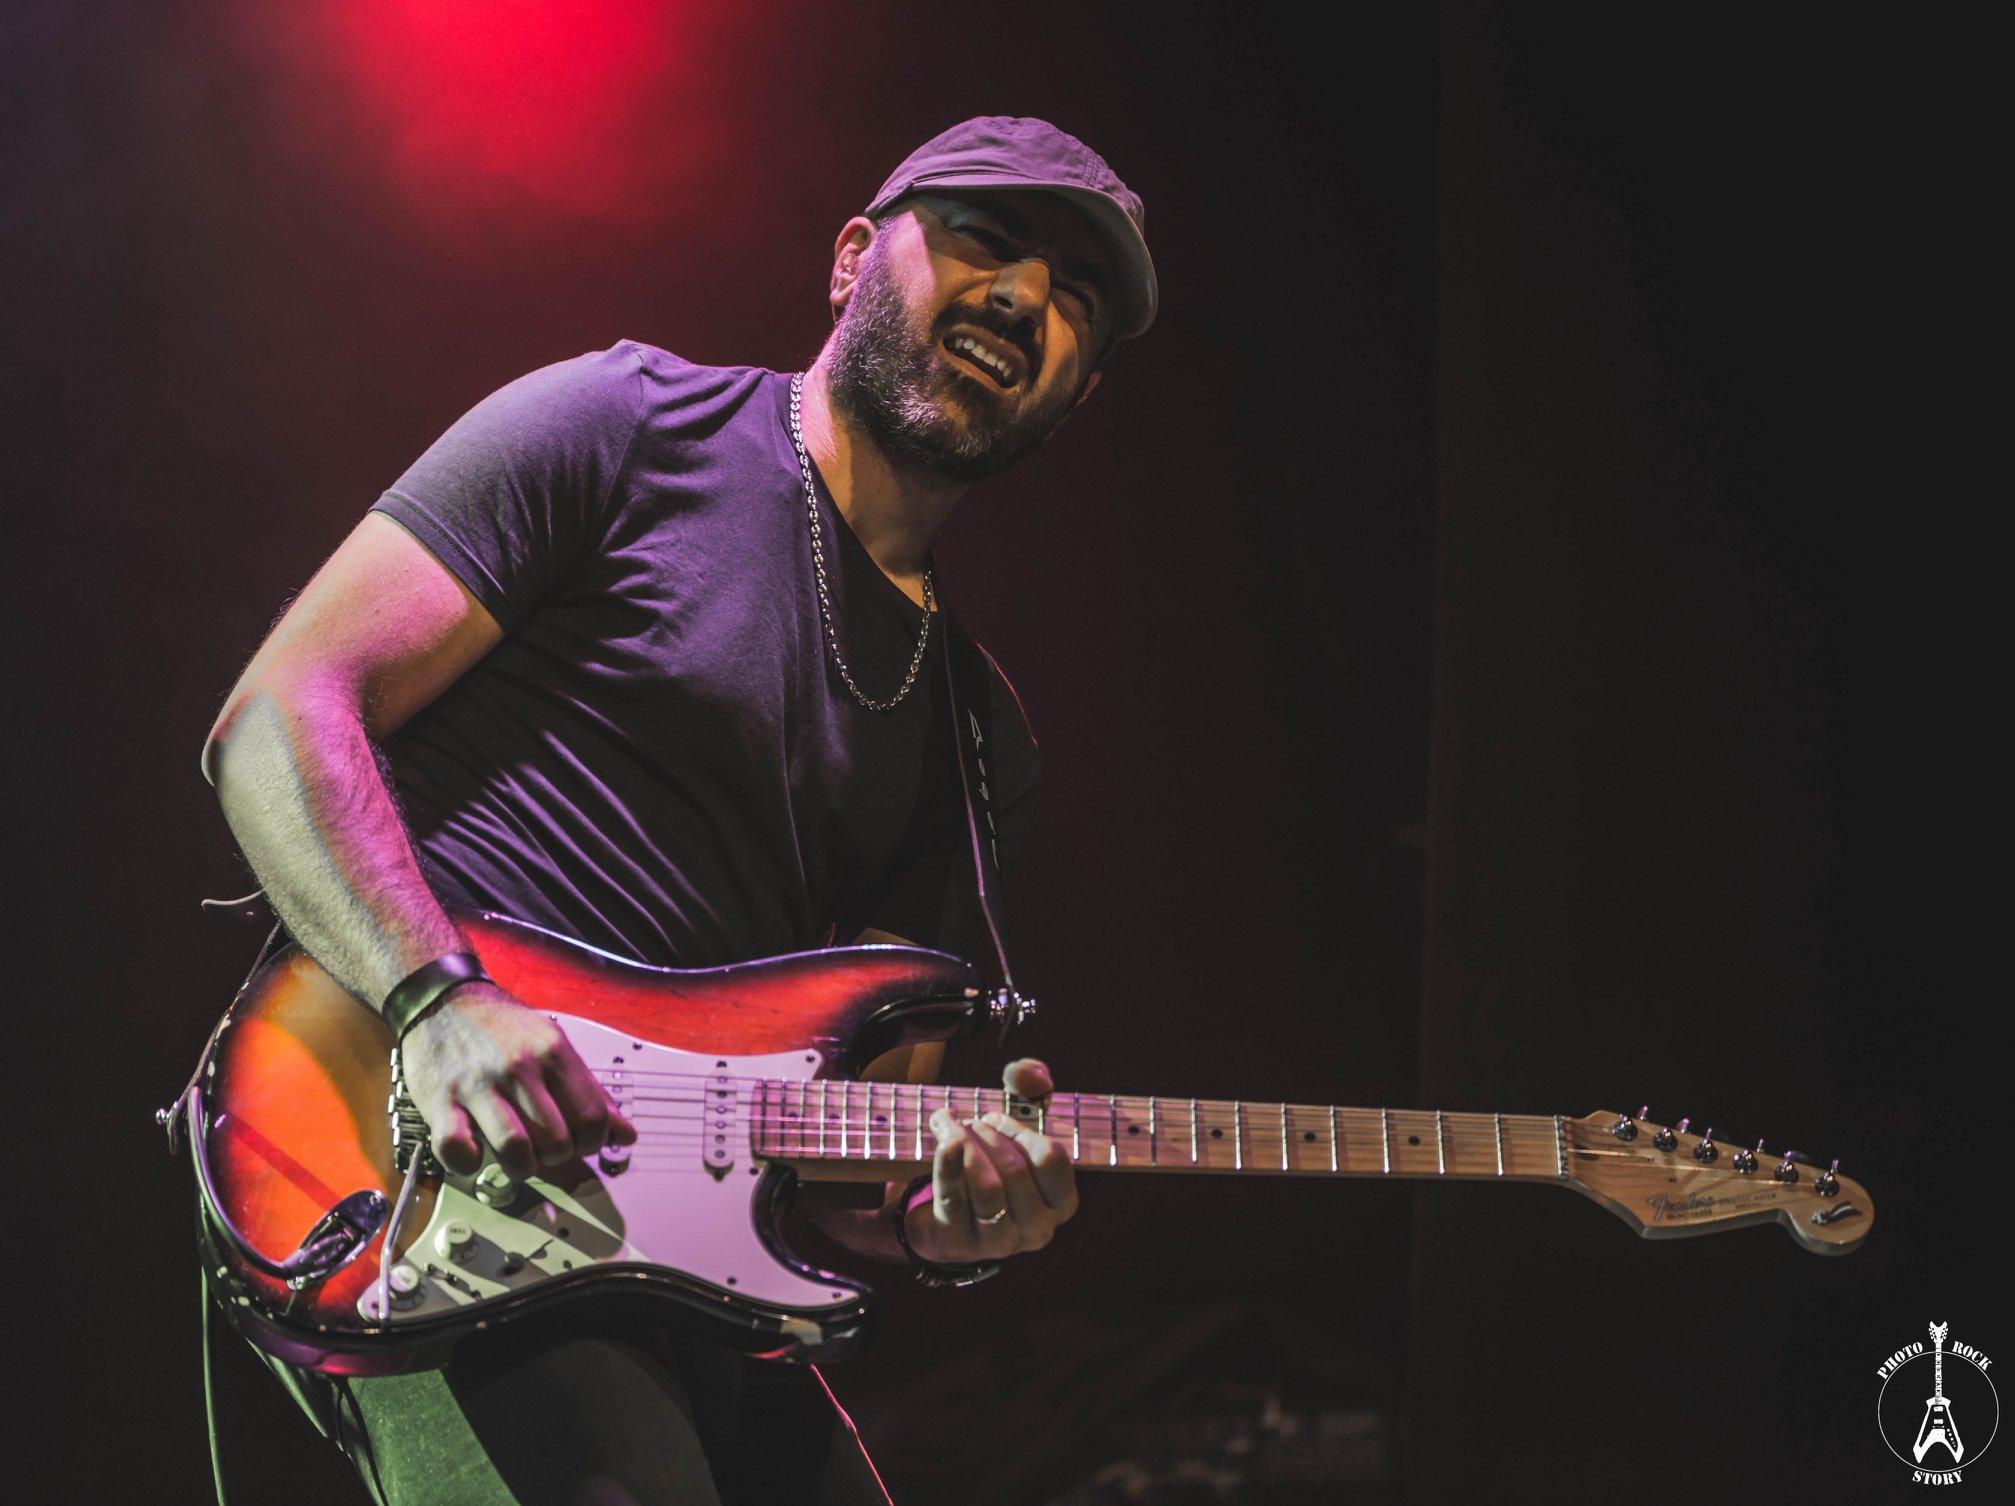 Lorenzo Carancini chitarrista strumenti musicali